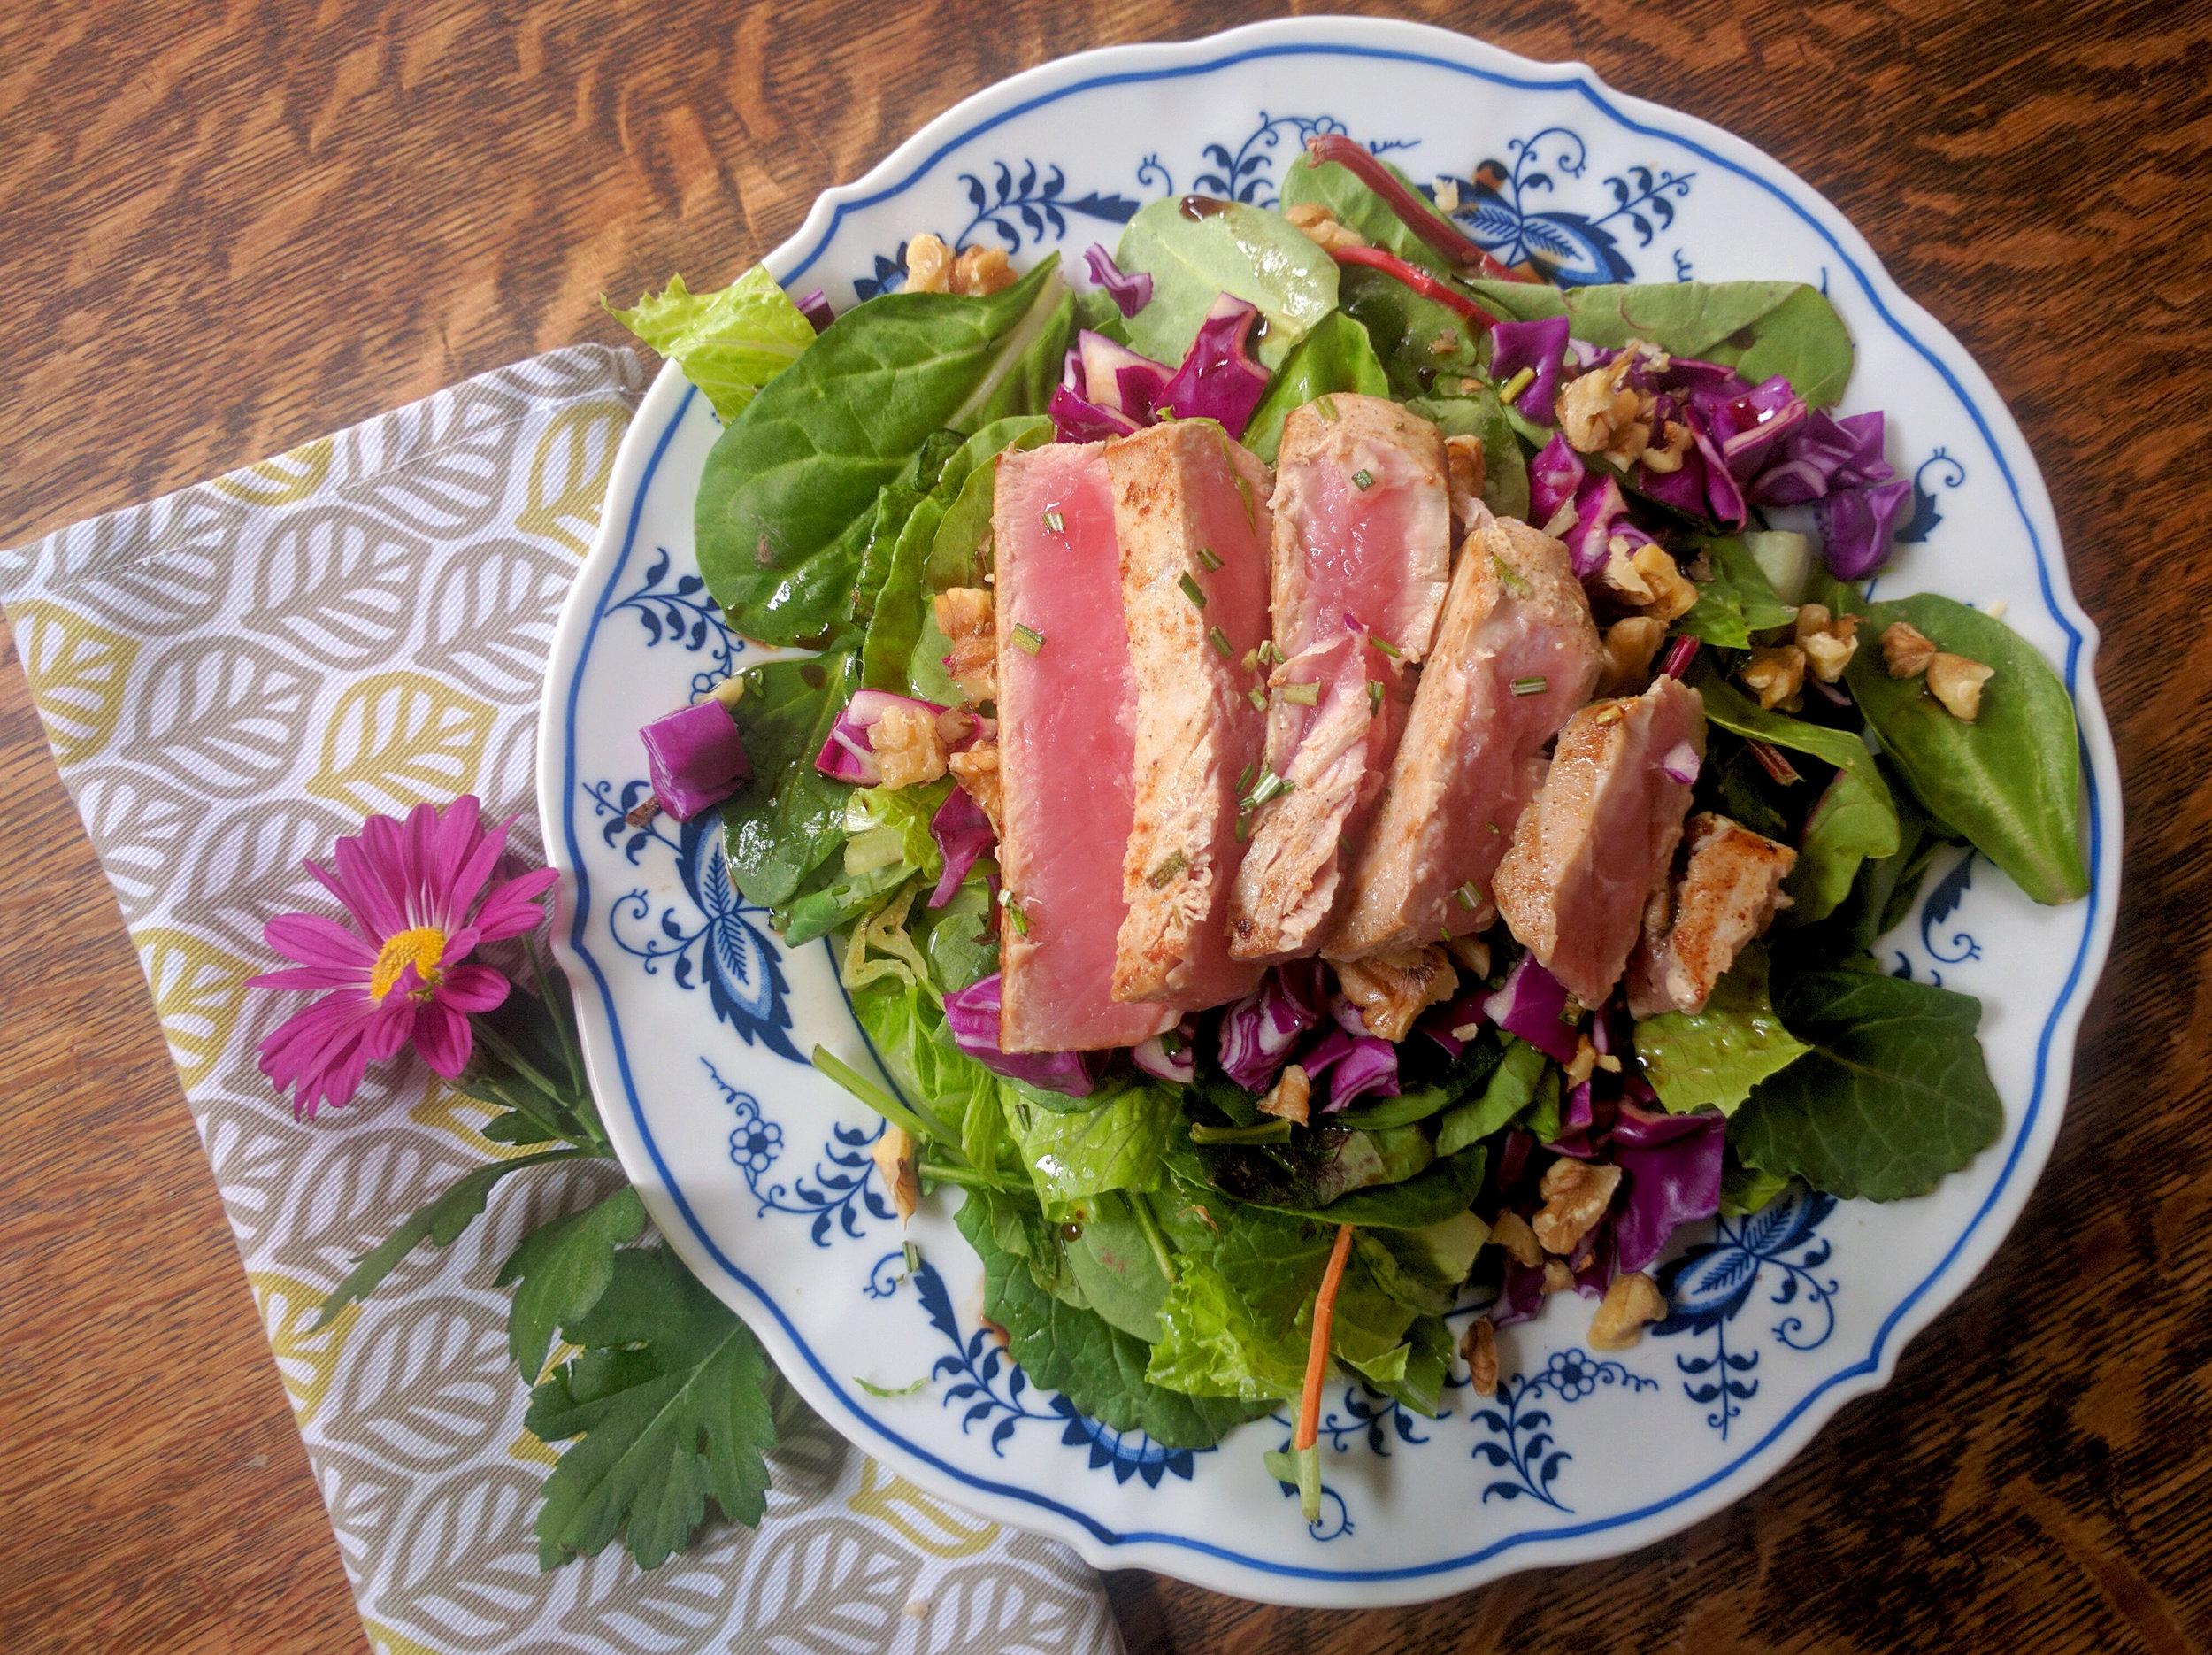 tuna steak, whole30, whole30 recipes, salad, tuna steak recipe, fish recipe